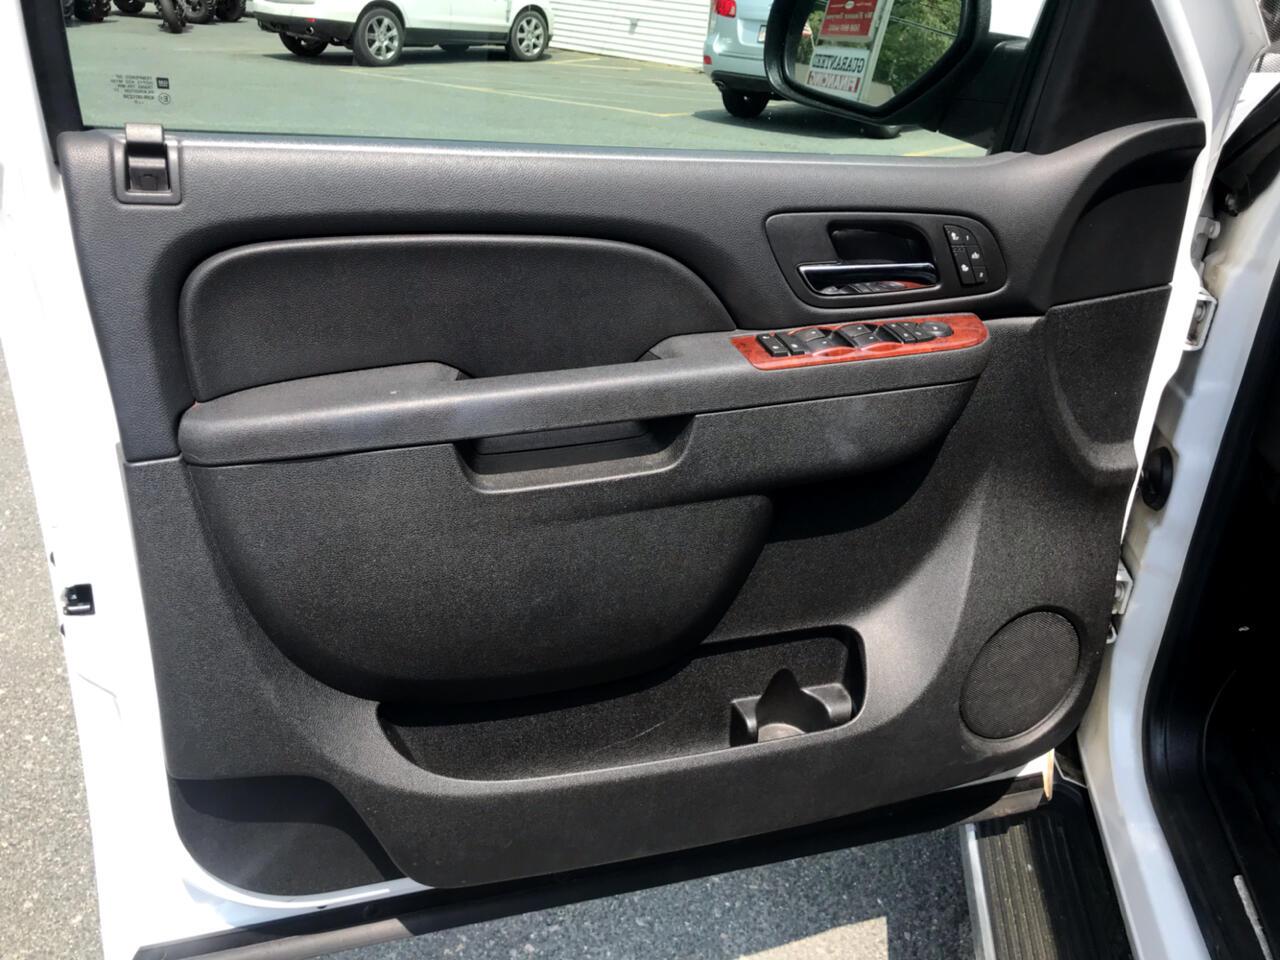 2010 Chevrolet Silverado 1500 LTZ Extended Cab 4WD